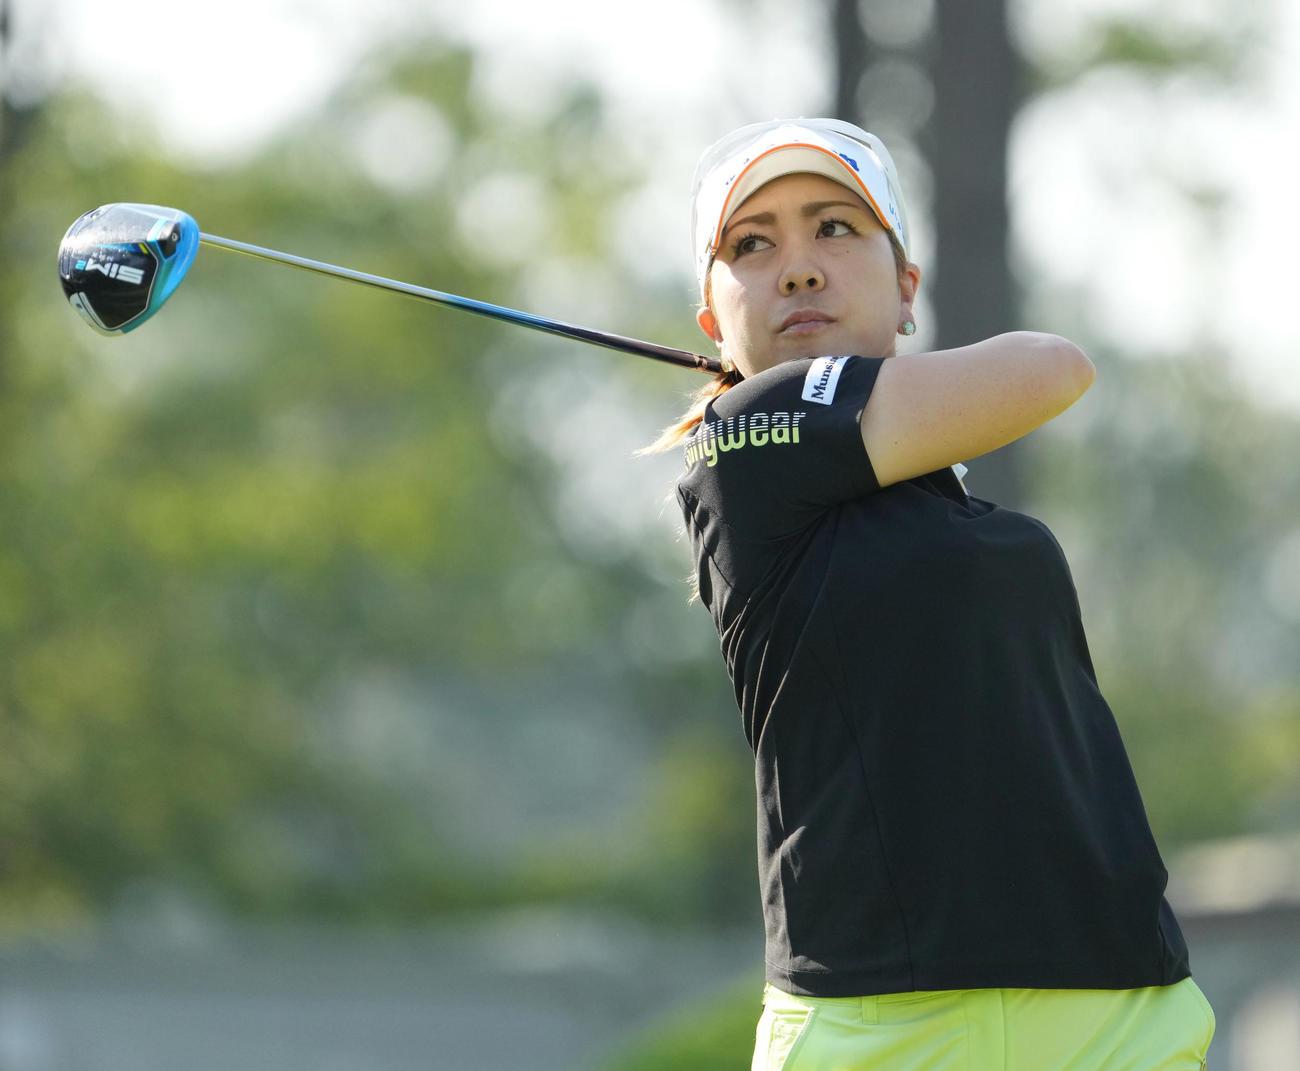 https://www.nikkansports.com/sports/golf/news/img/202106100000032-w1300_2.jpg